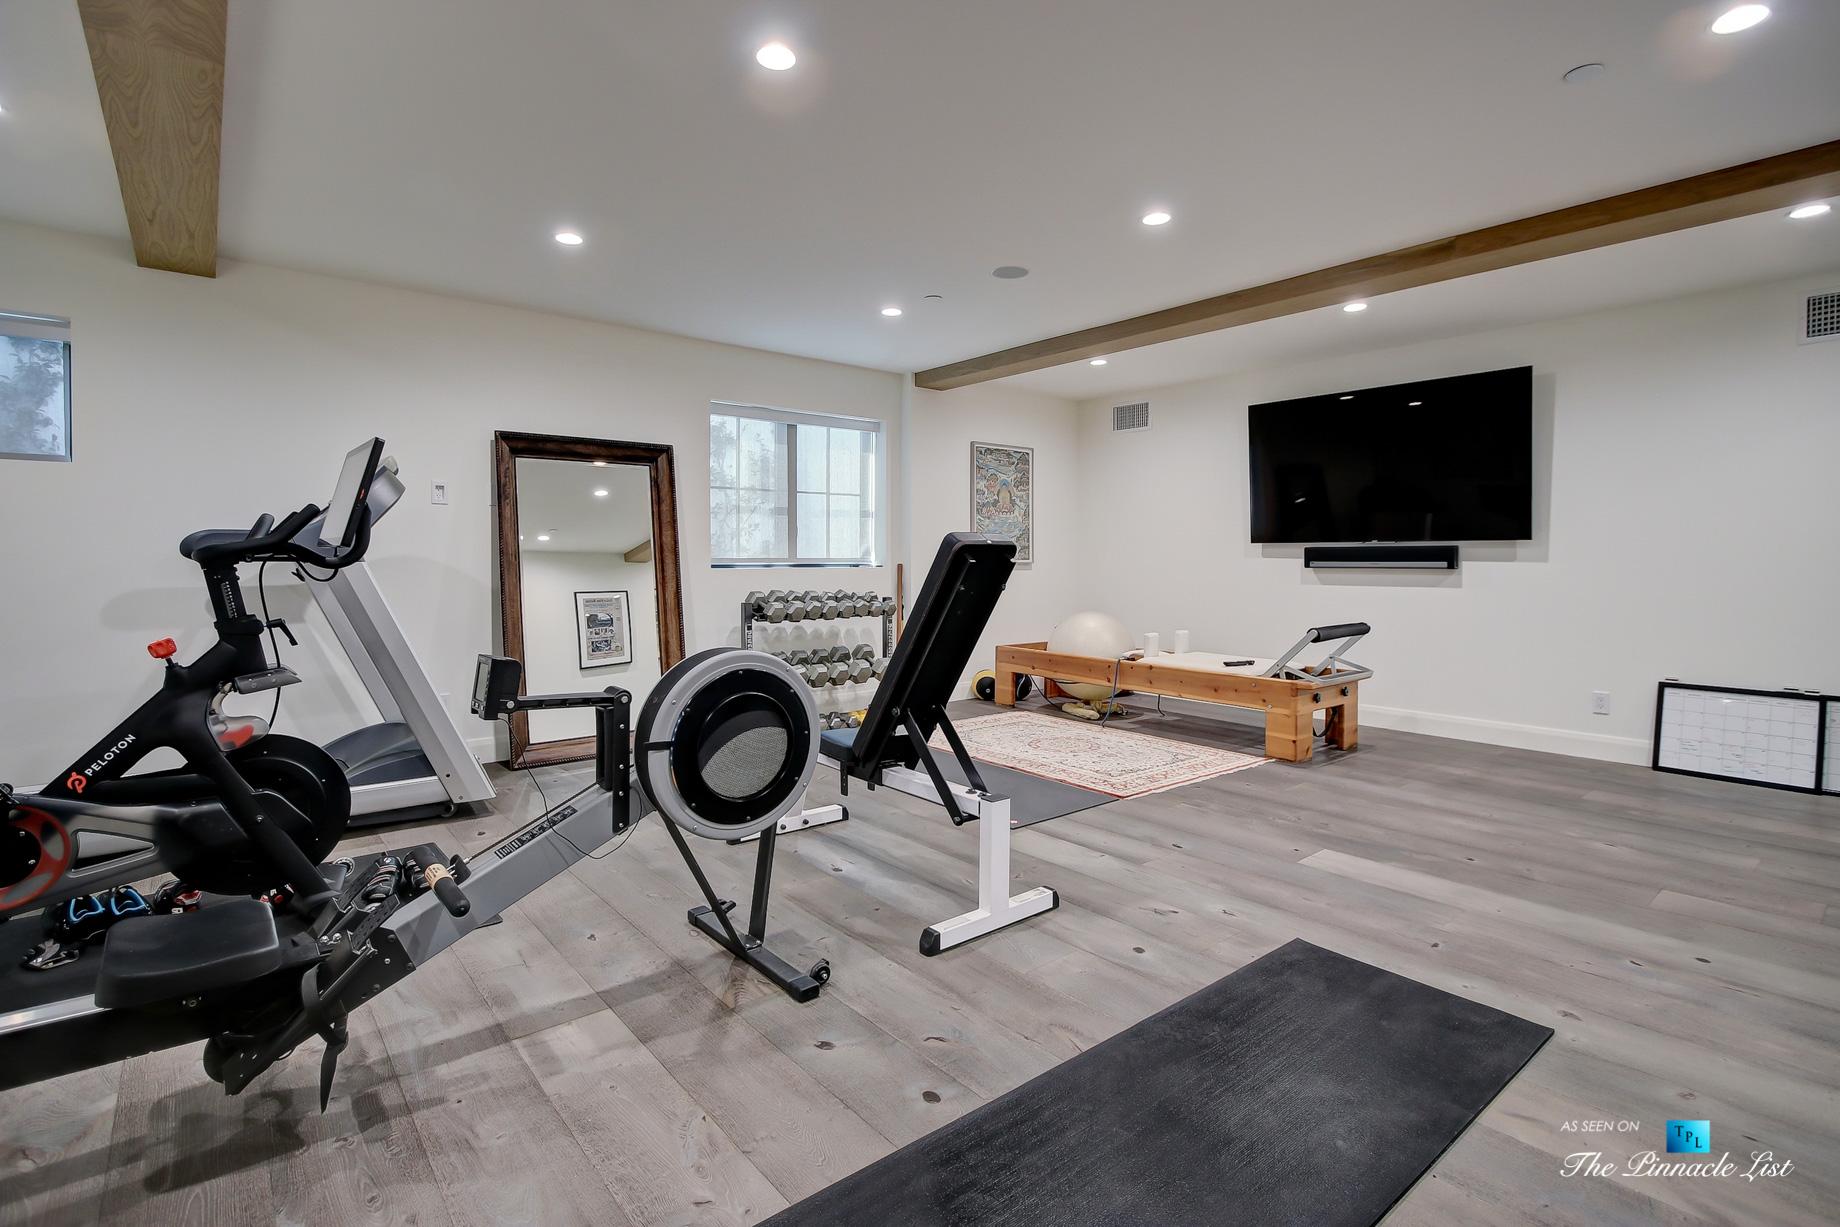 825 Highview Ave, Manhattan Beach, CA, USA – Private Gym – Luxury Real Estate – Modern Spanish Home